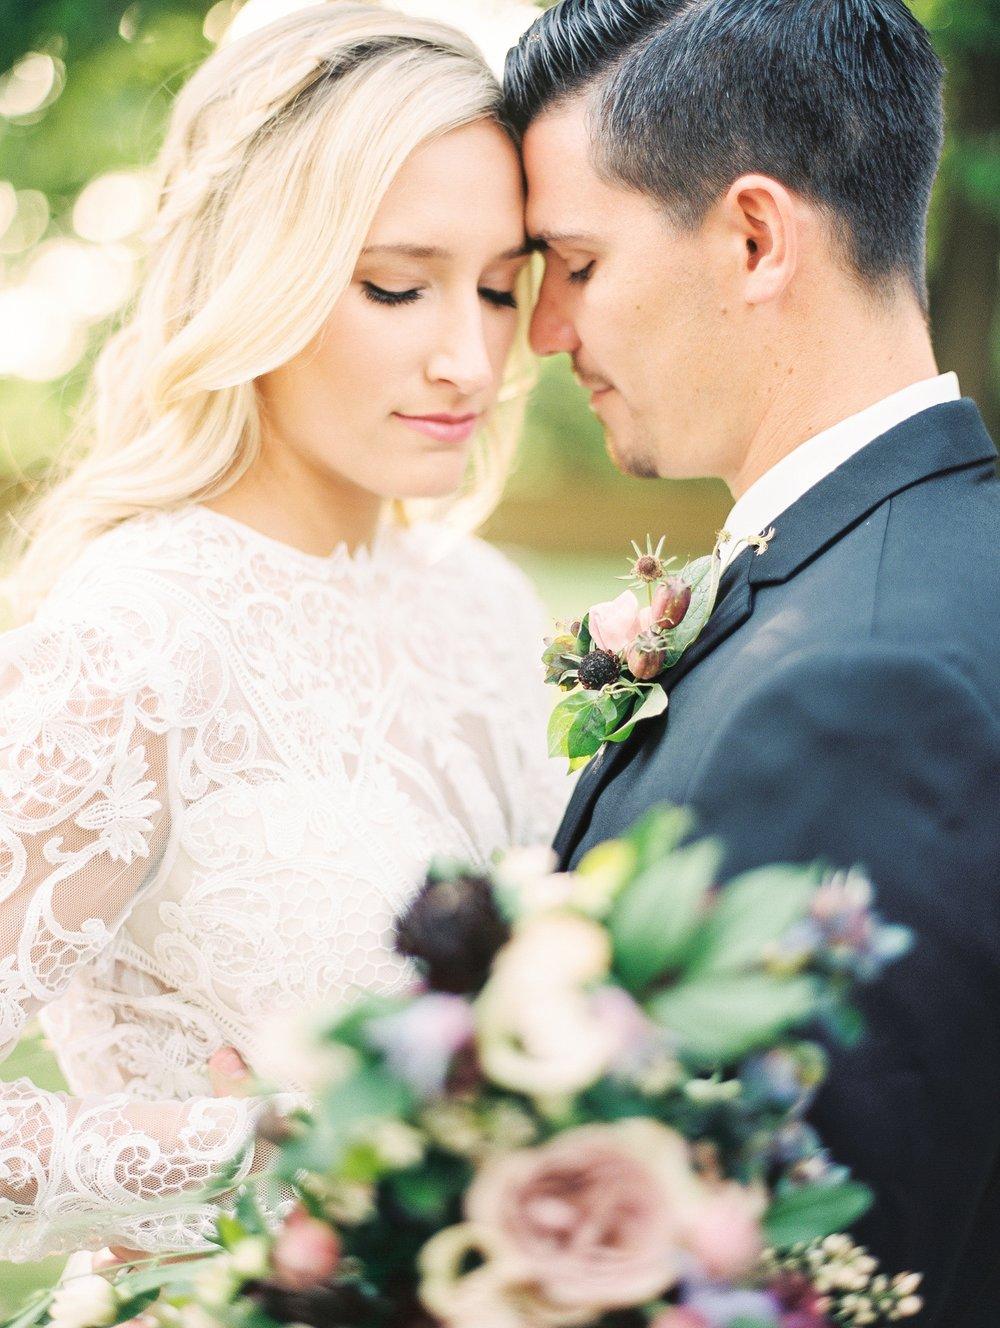 Elope In Style - Jessica Kersey - Northwest Arkansas Wedding Photographer_0197